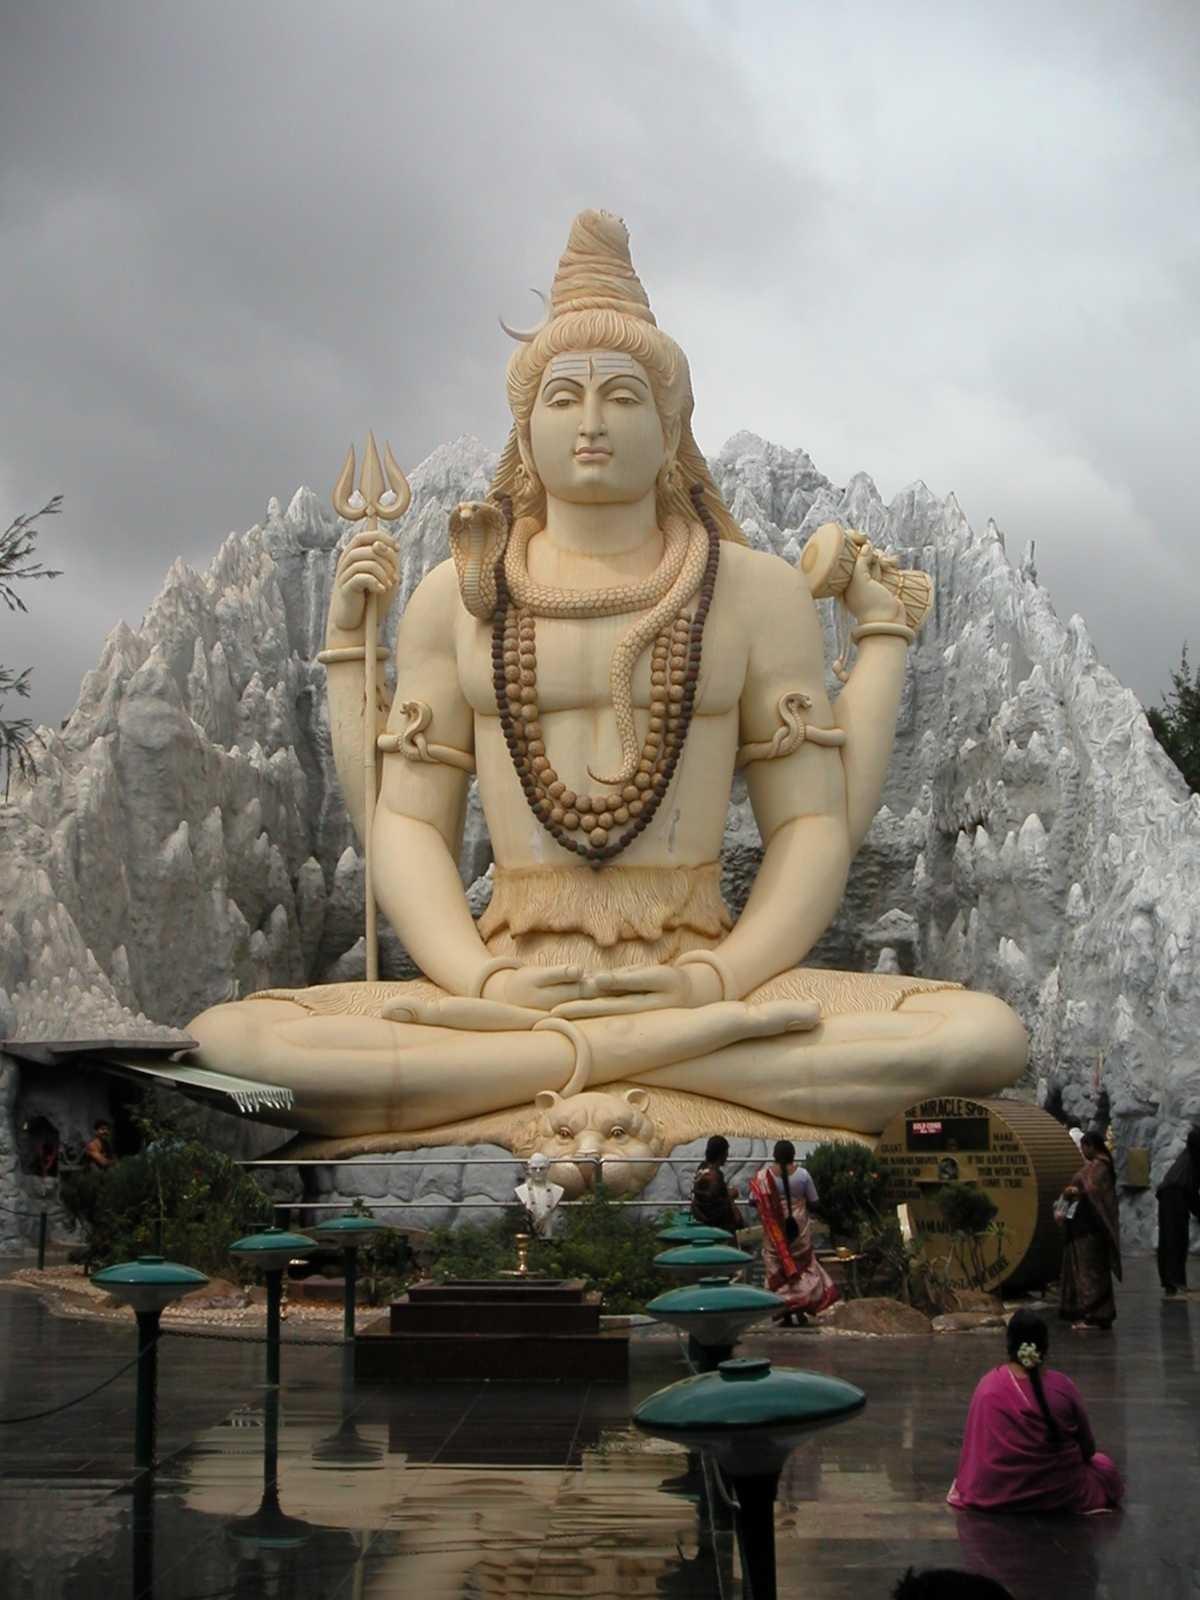 Hindu's primal deity Lord_shiva